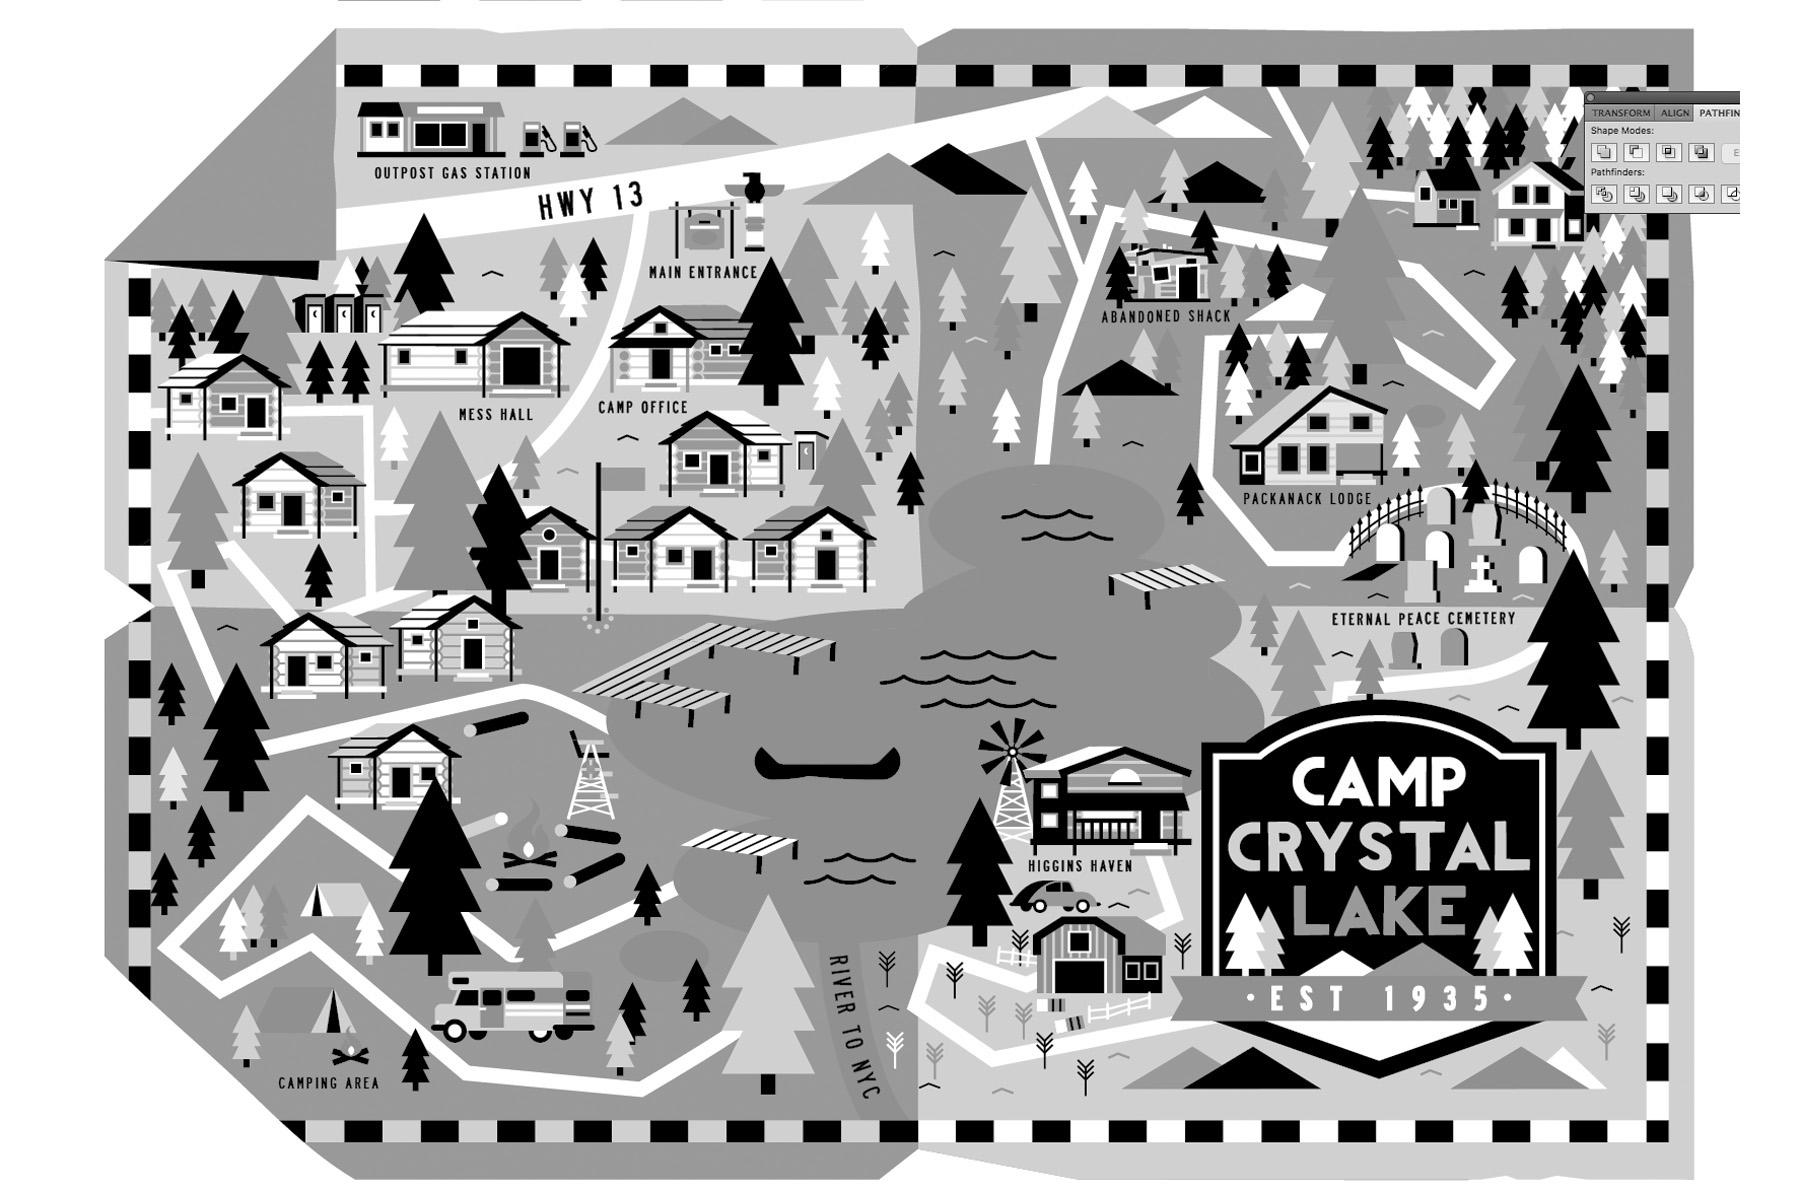 camp crystal lake map Camp Crystal Lake Illustrated Map On Behance camp crystal lake map